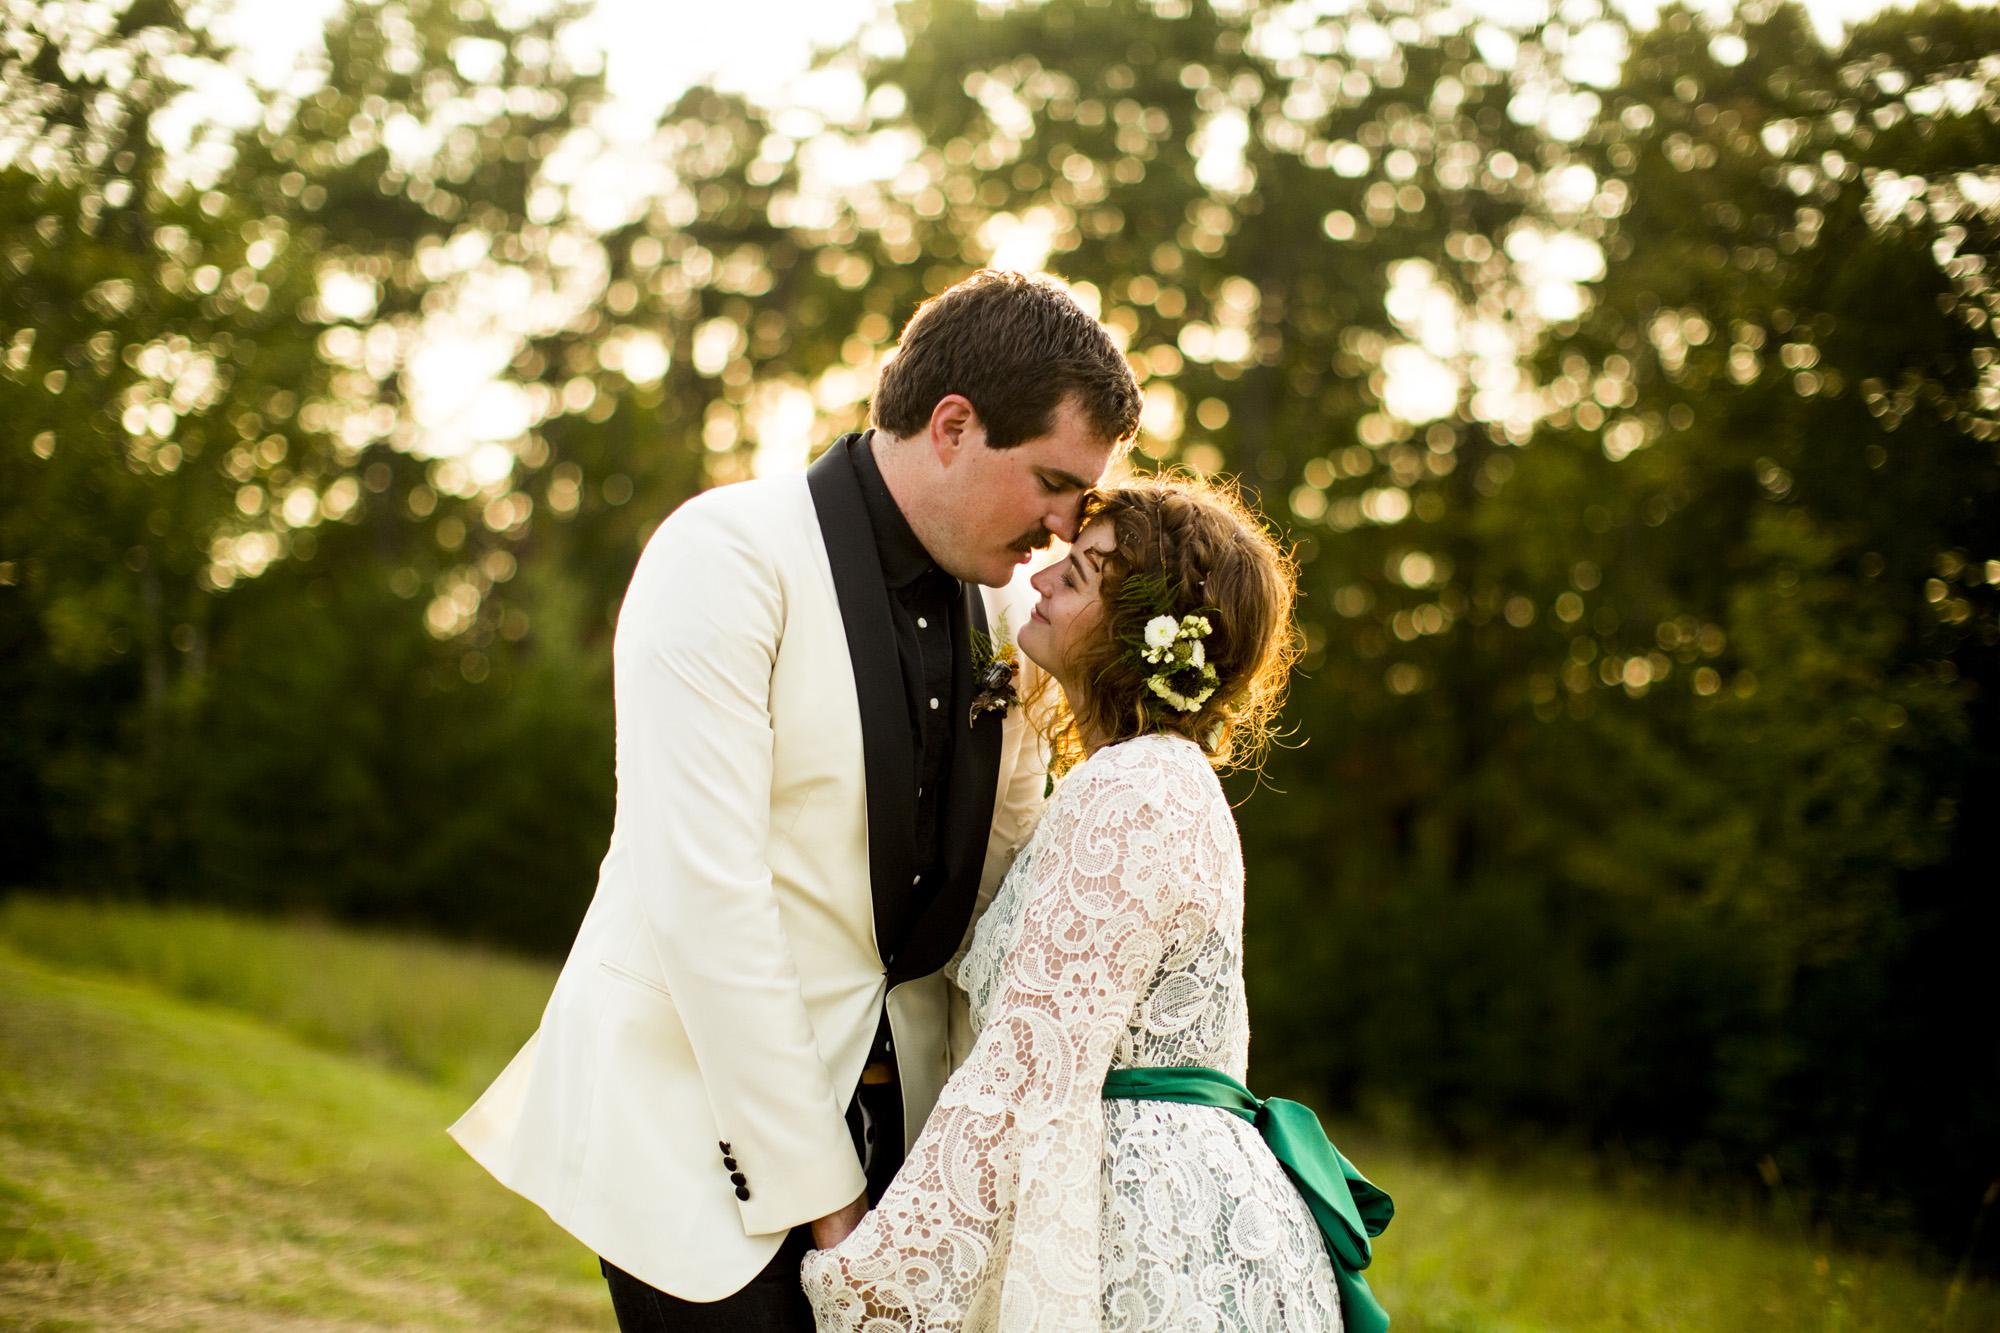 Seriously_Sabrina_Photography_Red_River_Gorge_Kentucky_Wedding_ShawnDana151.jpg